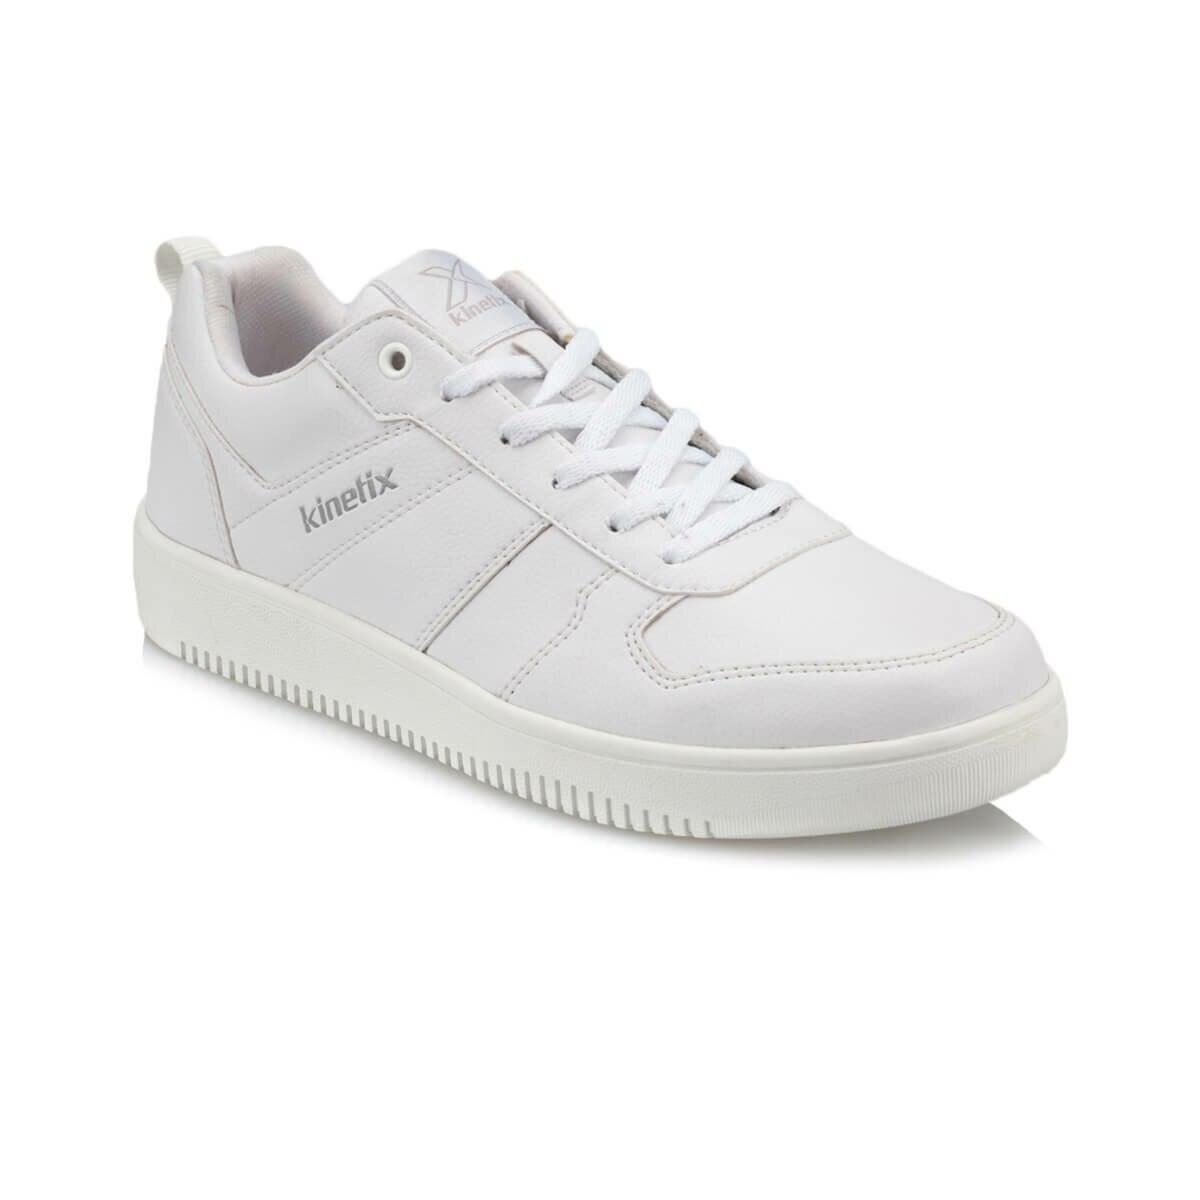 chaussures-baskets-homme-flo-iktus-m-9pr-noir-kinetix